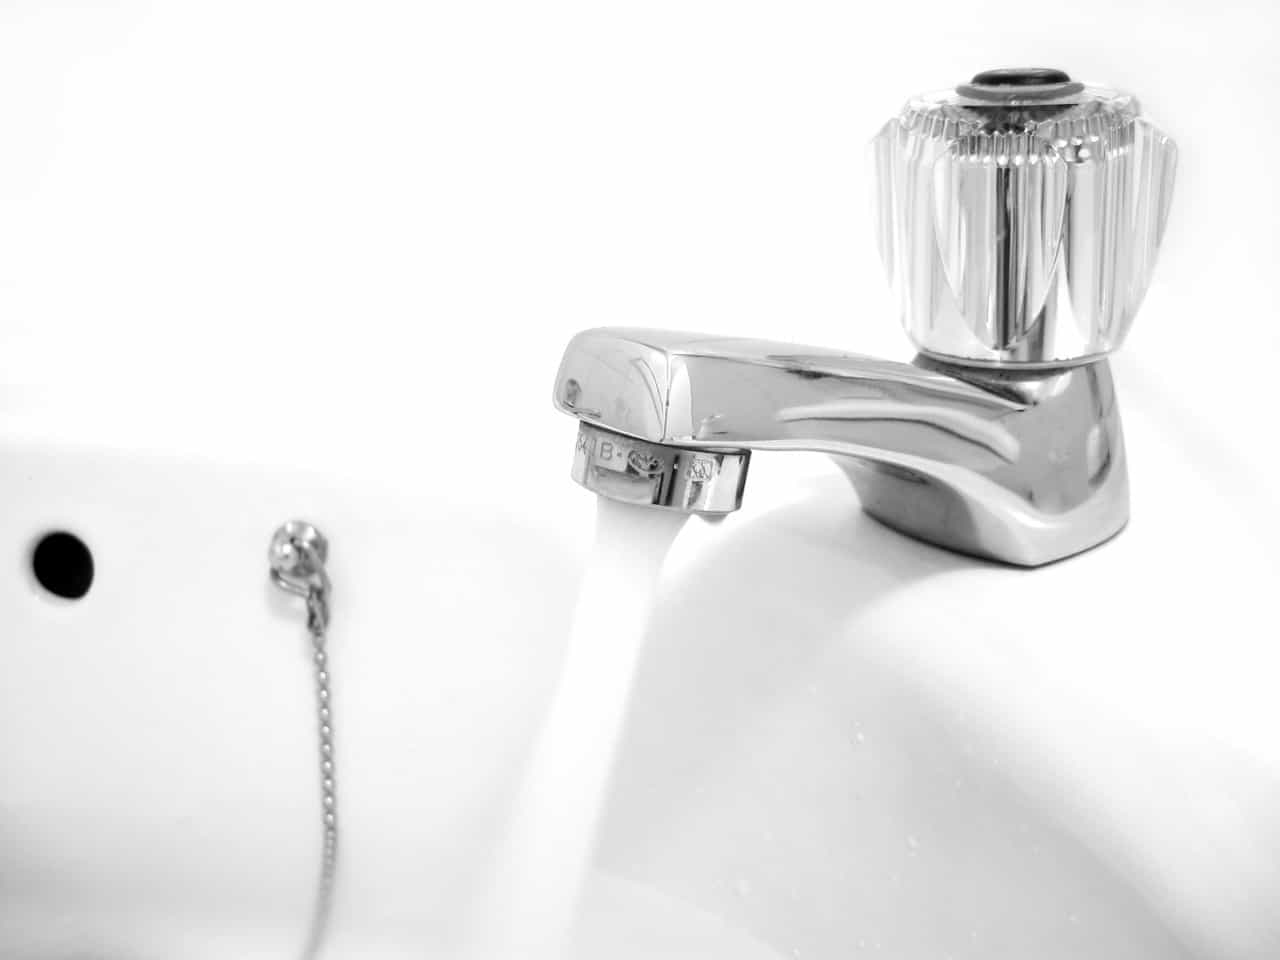 Vodovodní kohoutek - proud vody (freeimages.com)